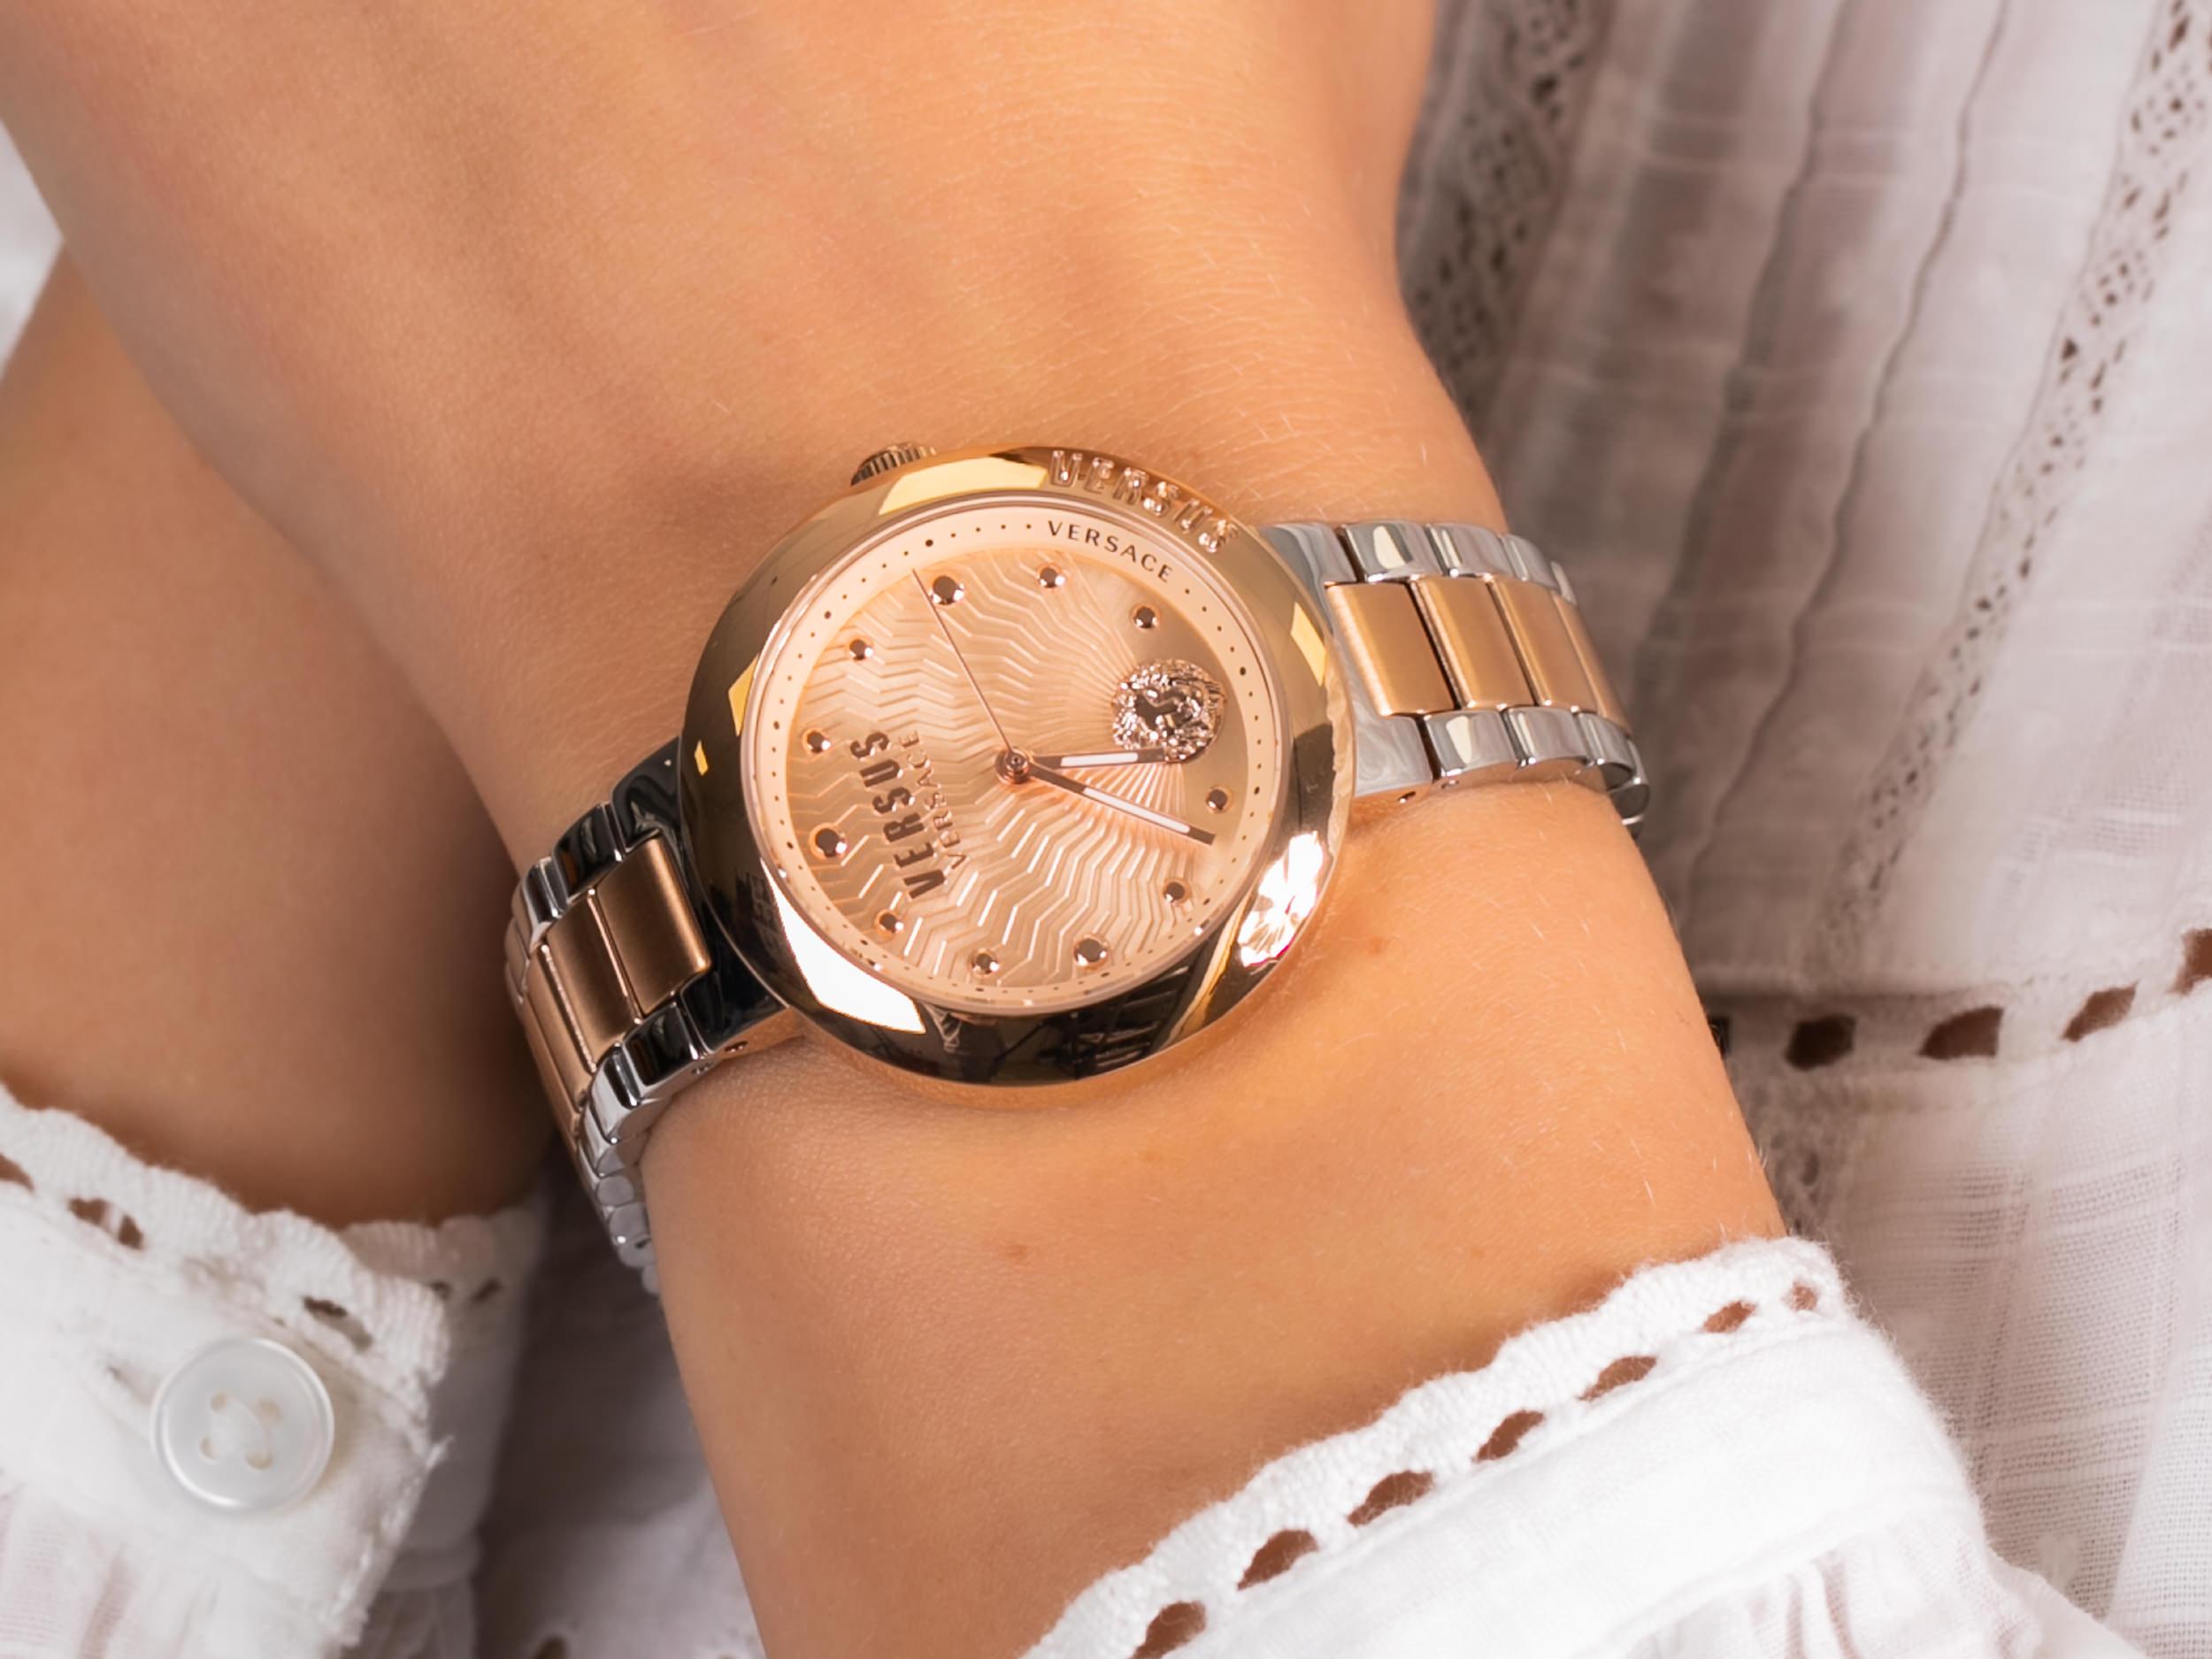 Versus Versace VSP370617 LANTAO ISLAND zegarek fashion/modowy Damskie